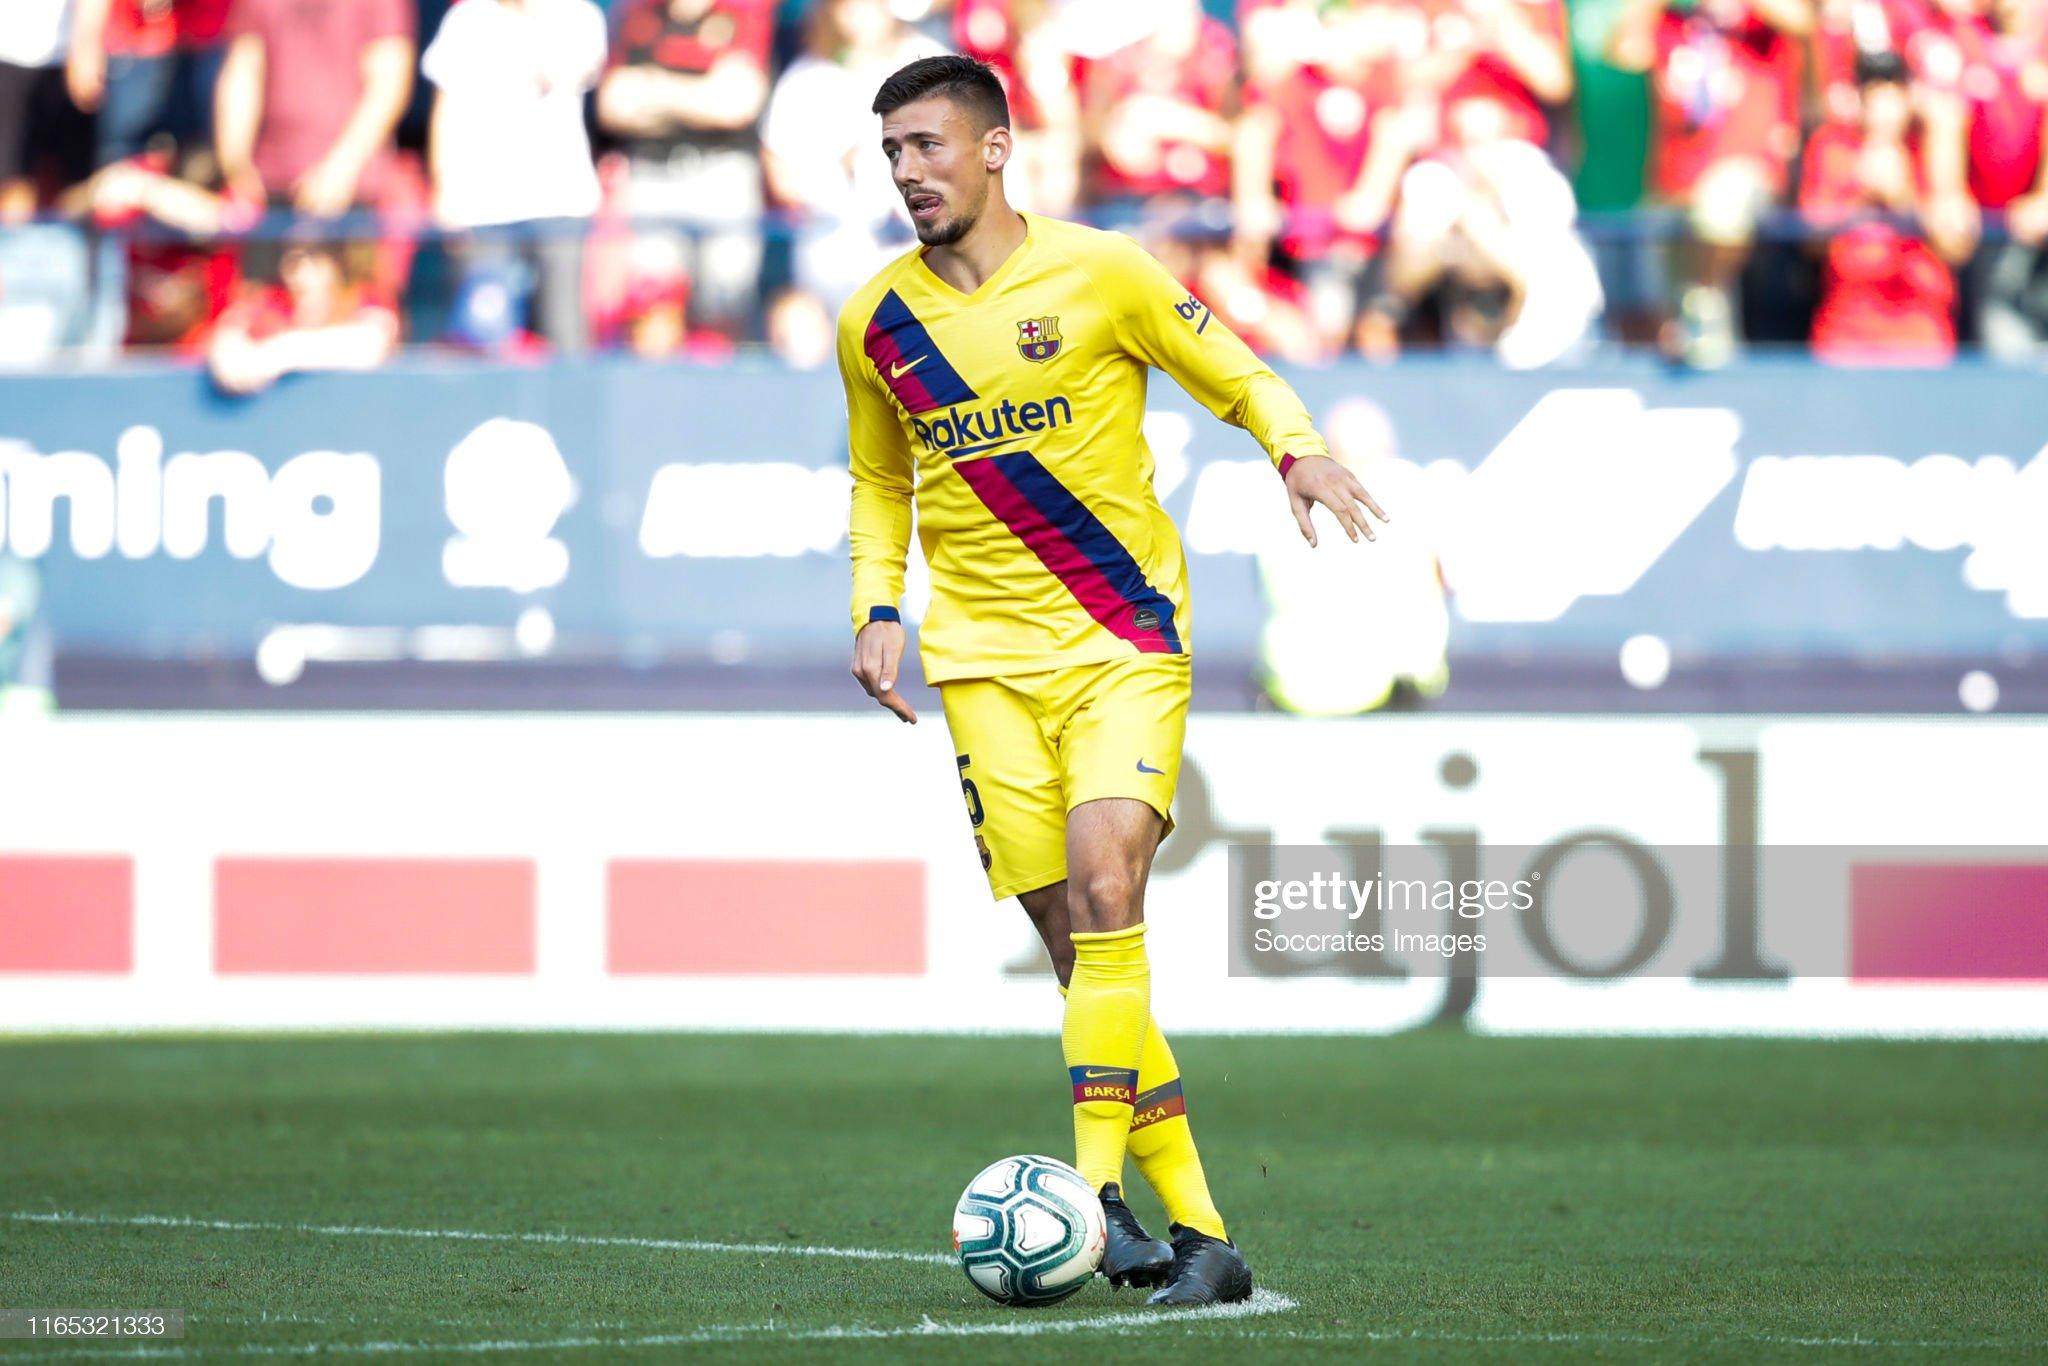 صور مباراة : أوساسونا - برشلونة 2-2 ( 31-08-2019 )  Clement-lenglet-of-fc-barcelona-during-the-la-liga-santander-match-picture-id1165321333?s=2048x2048